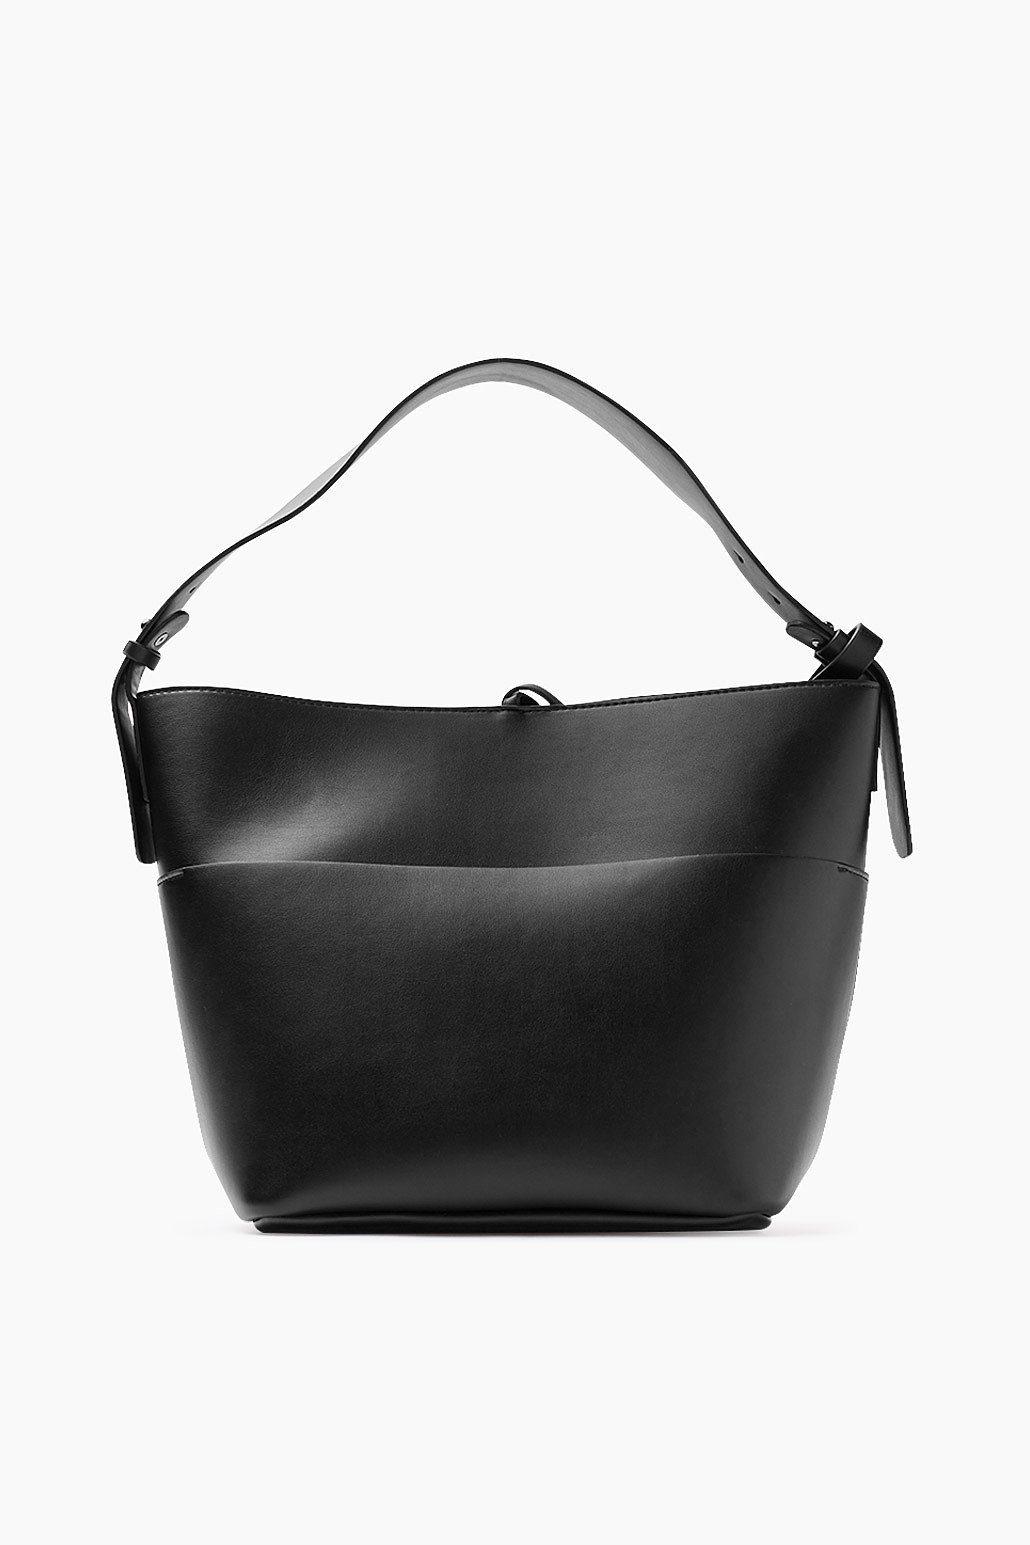 ESPRIT CASUAL City Bag mit herausnehmbarer Innentasche